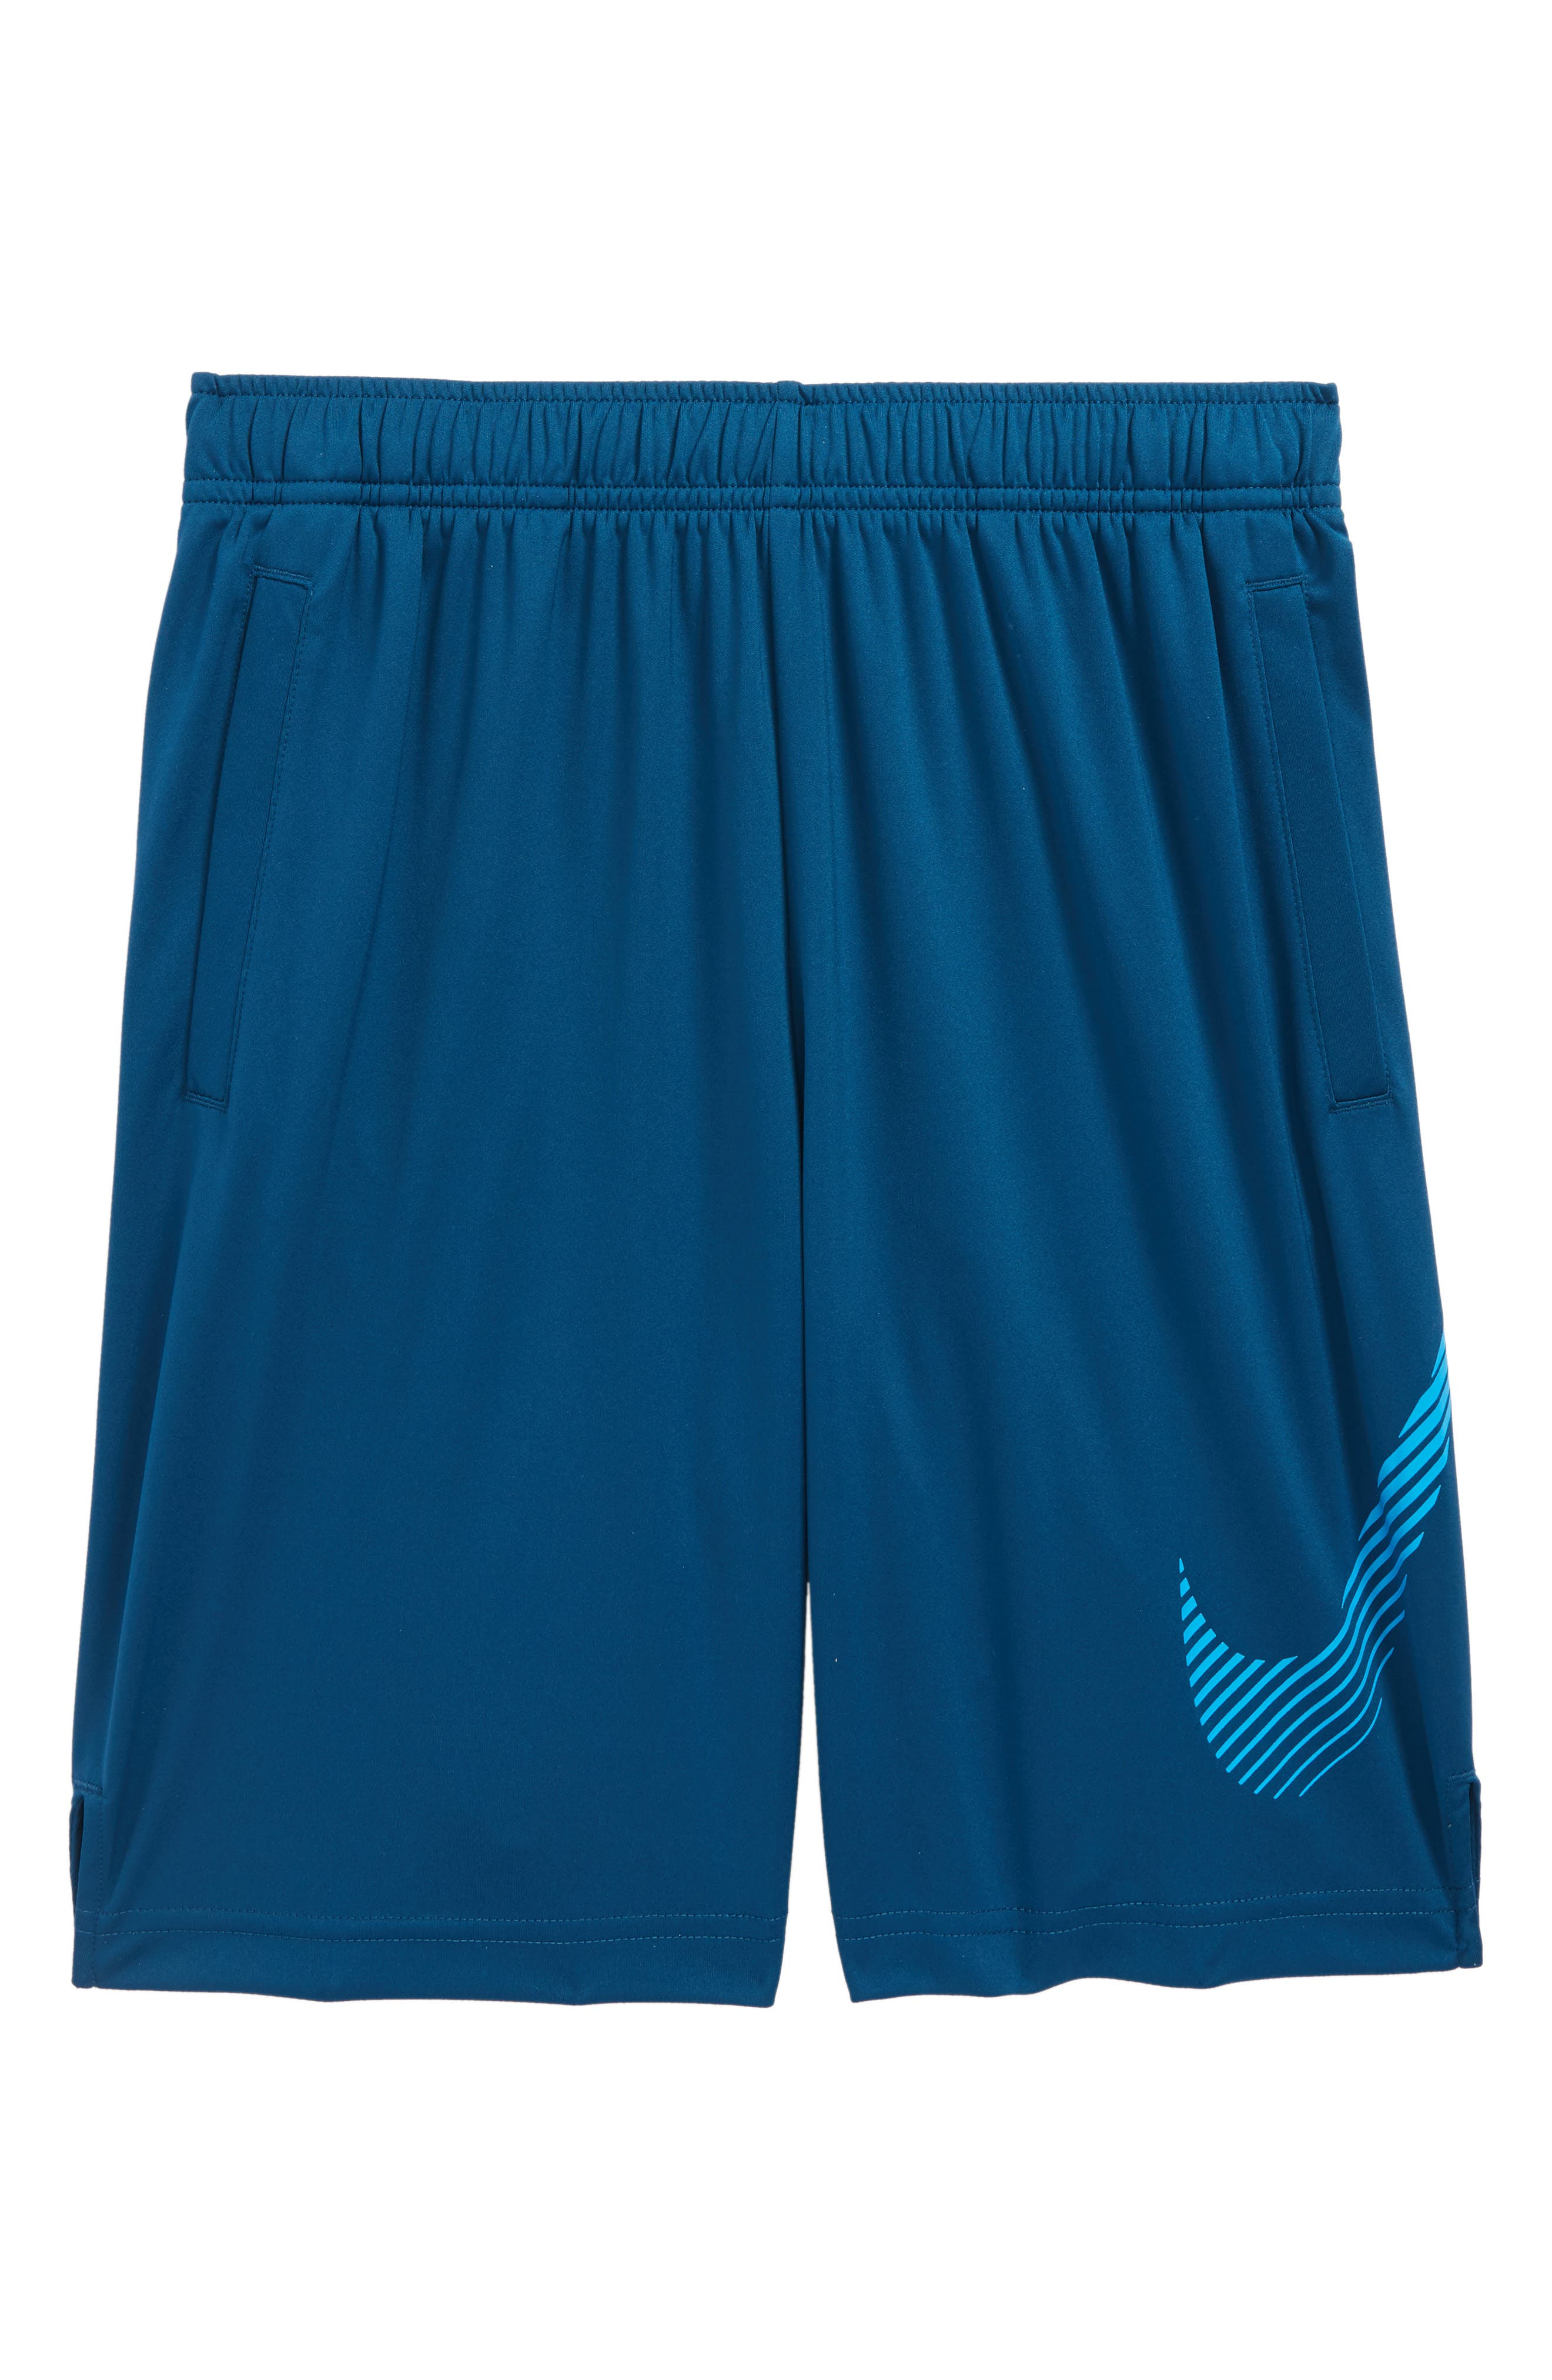 Dry Training Shorts,                         Main,                         color, Blue Force/ Equator Blue